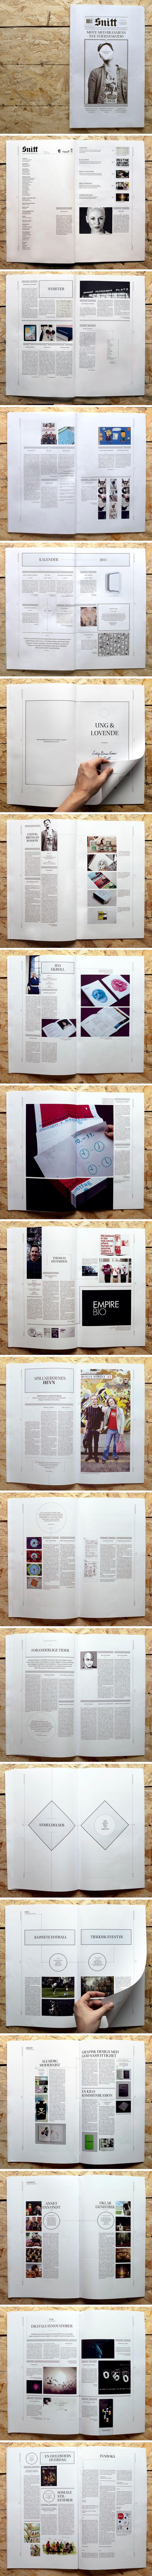 Snitt Magazine / Kristian Allen Larsen  라인 참고